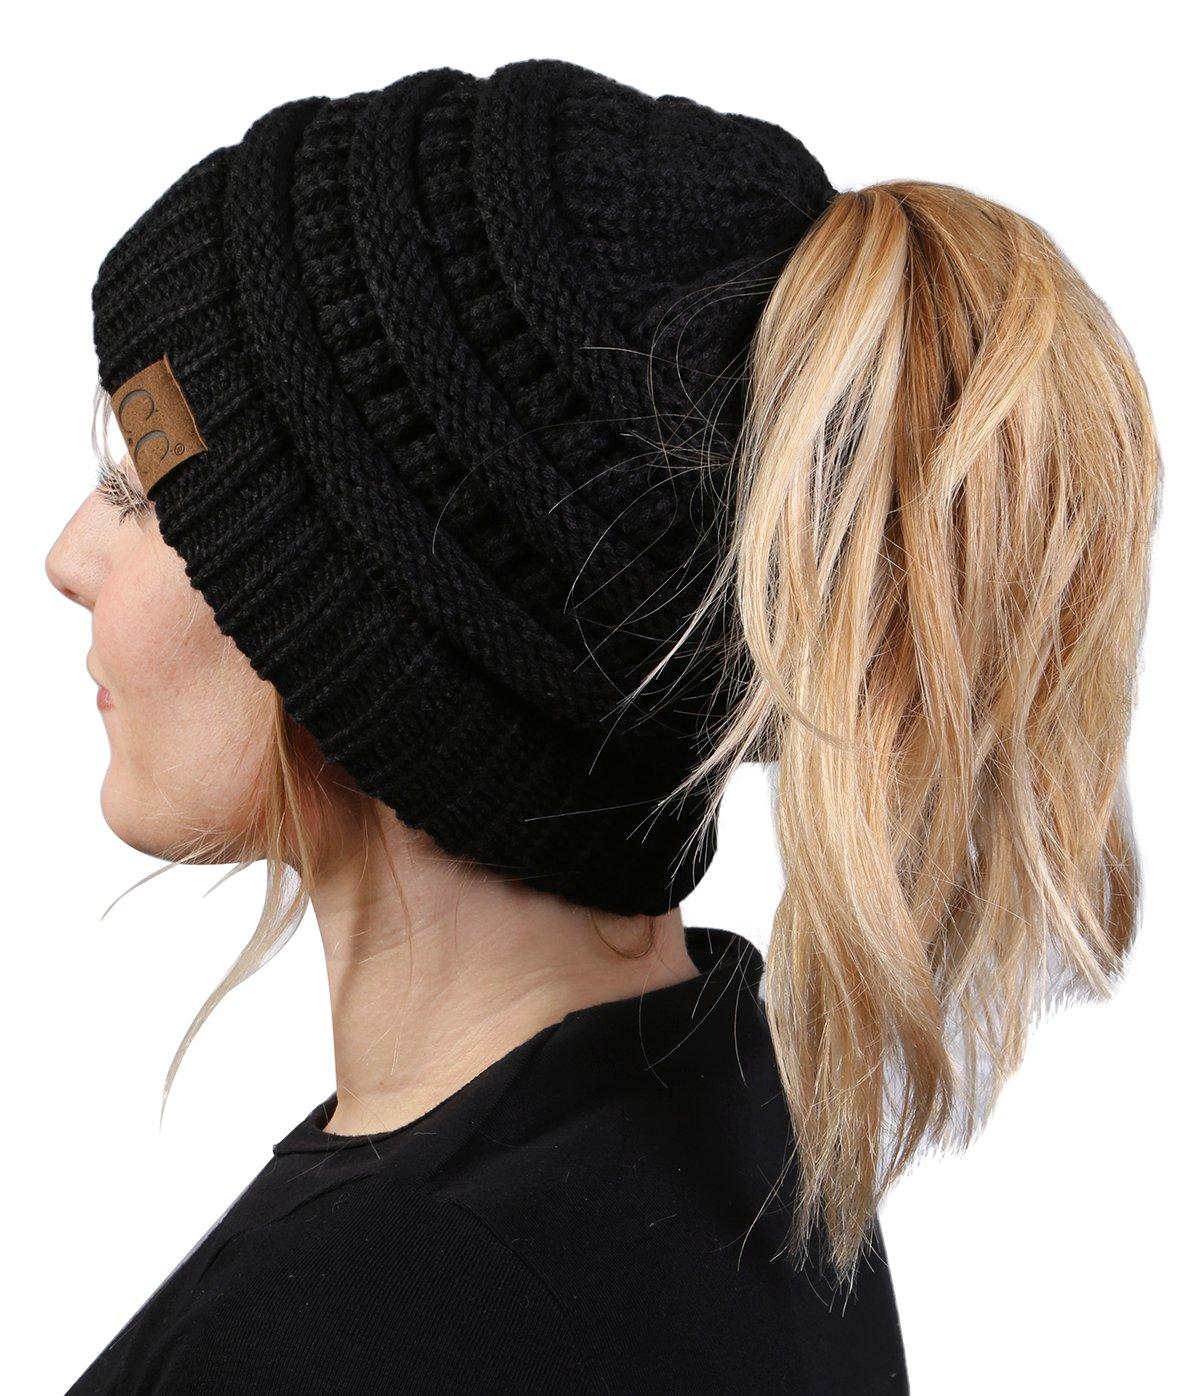 BT-6020a-06 Messy Bun Womens Winter Knit Hat Beanie Tail - Black